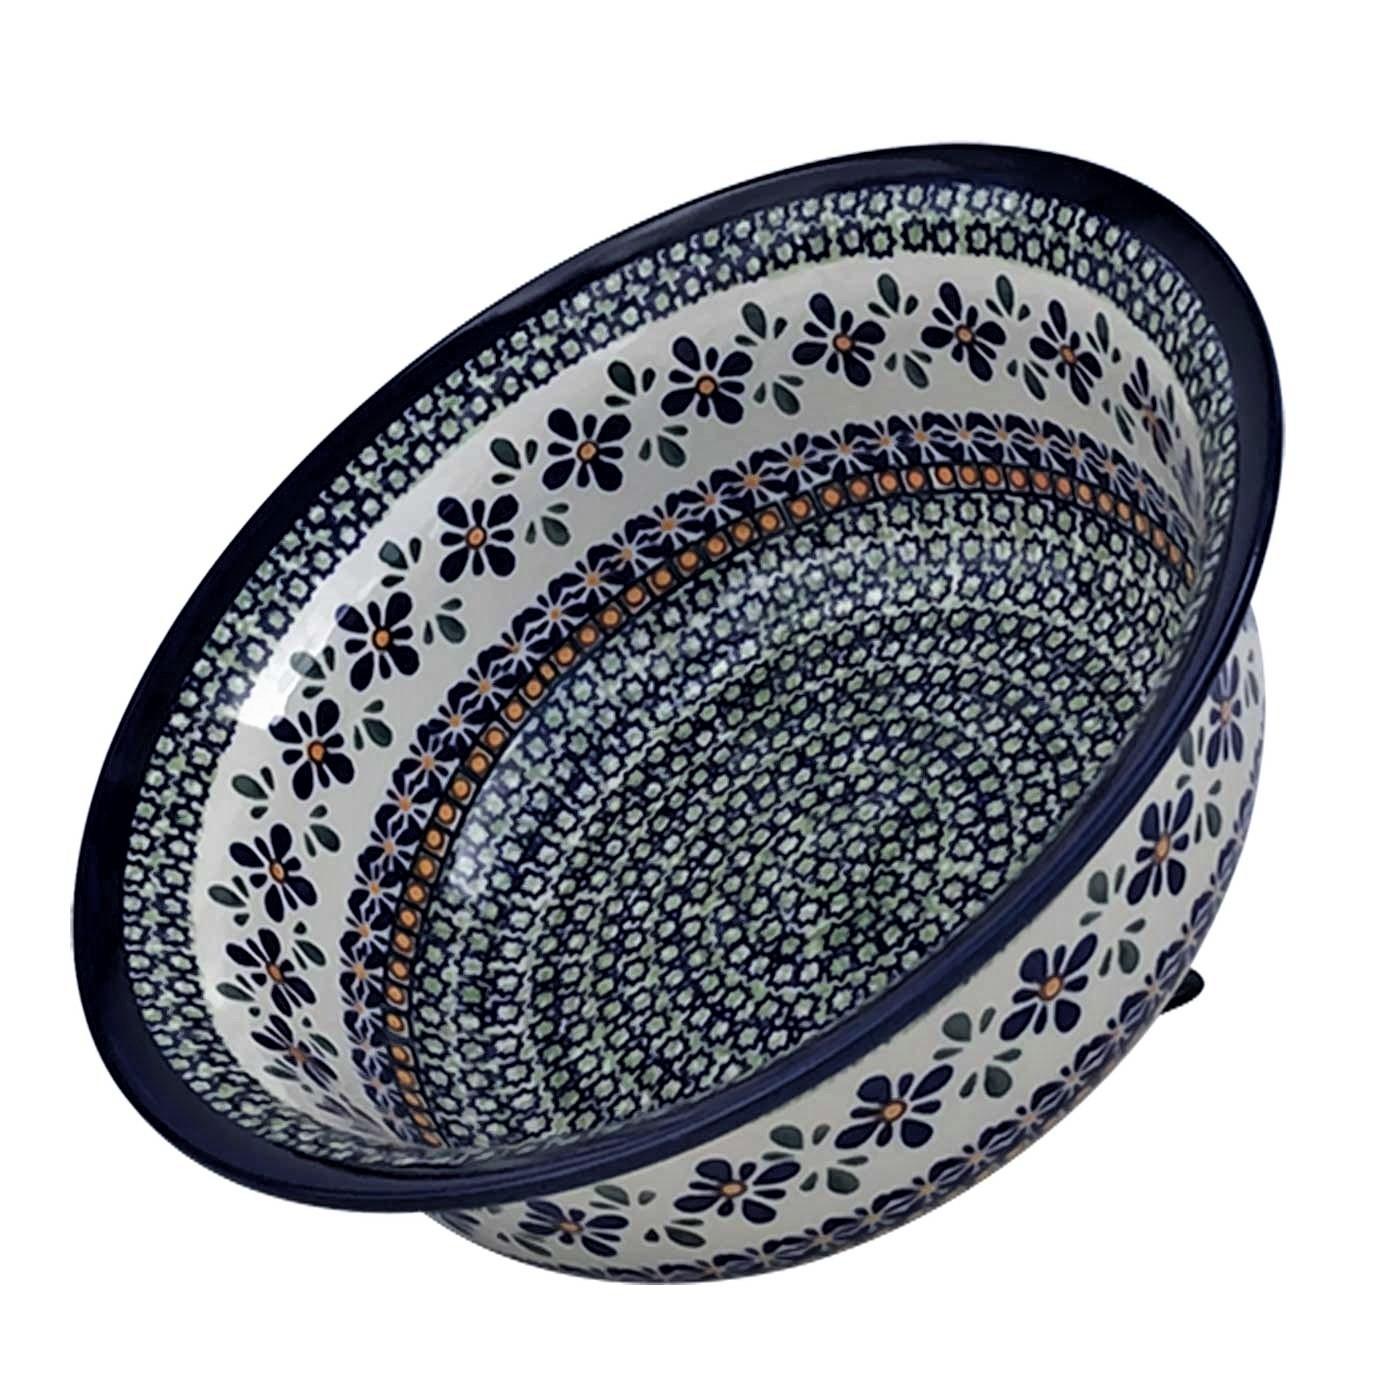 Pottery Avenue 61-oz Flared Top Stoneware Bowl - 1605-DU60 Sweetie Piel